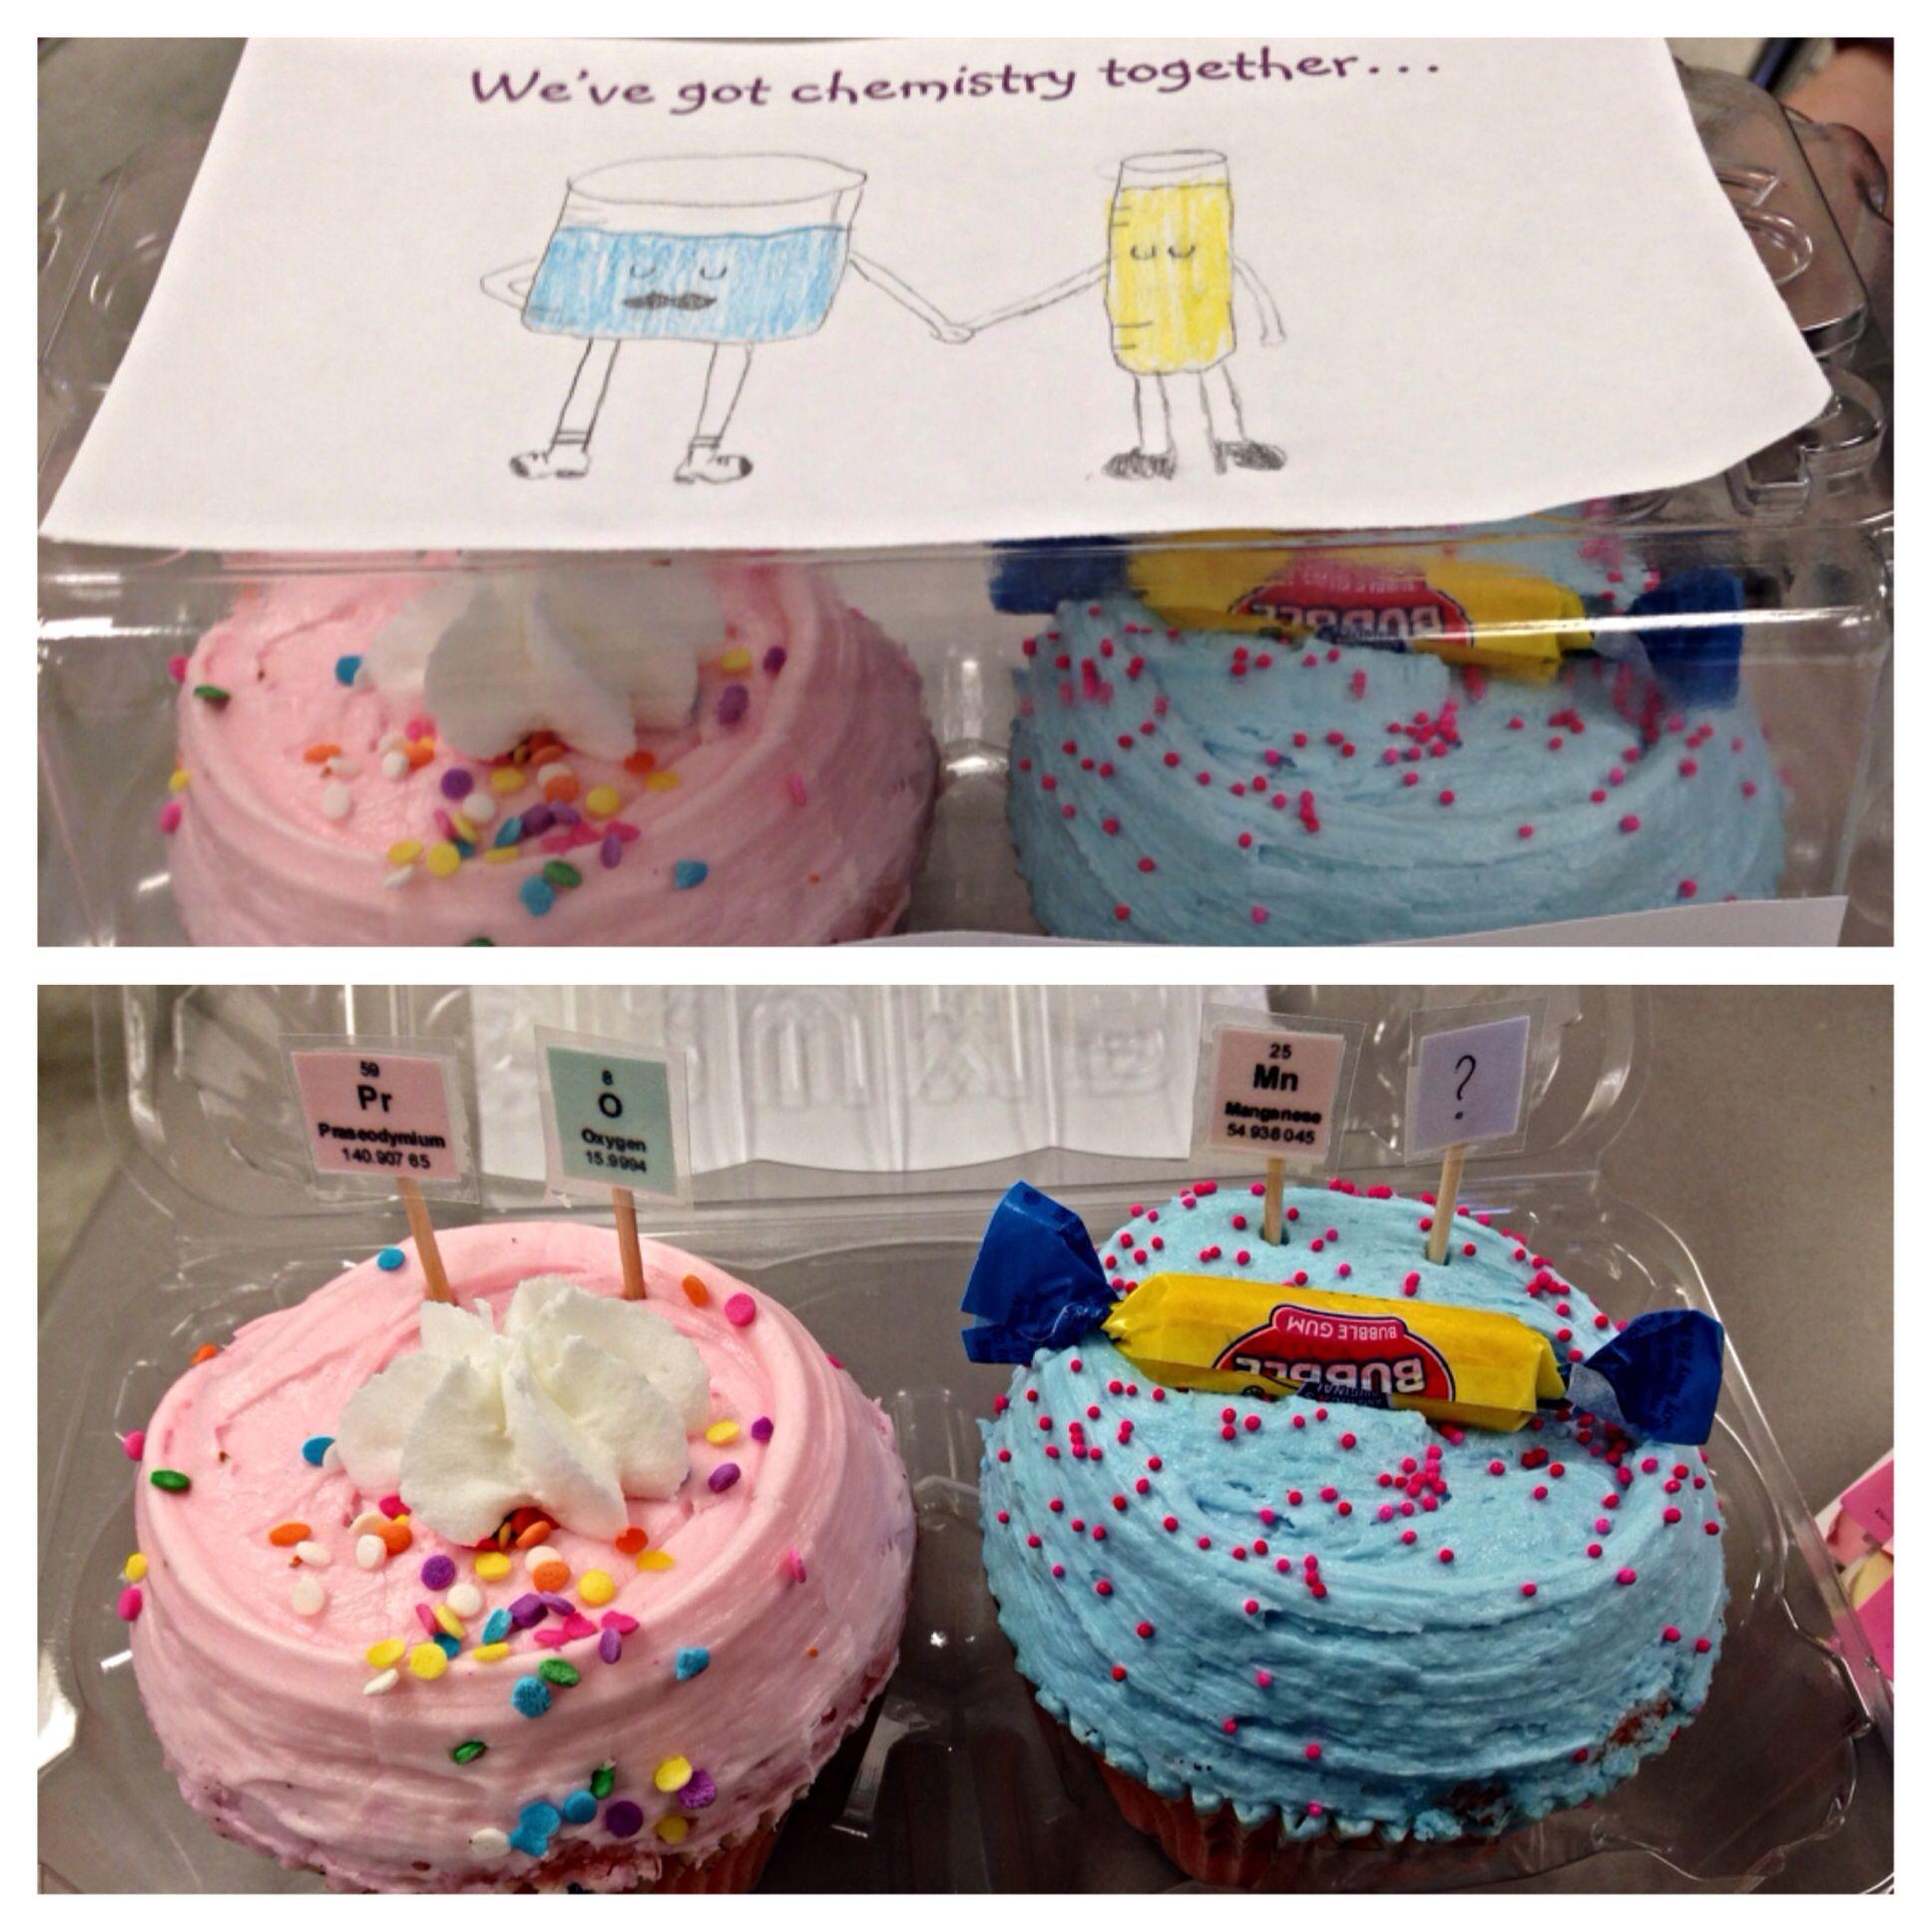 promposal an adorable idea cupcakes pinterest promposal